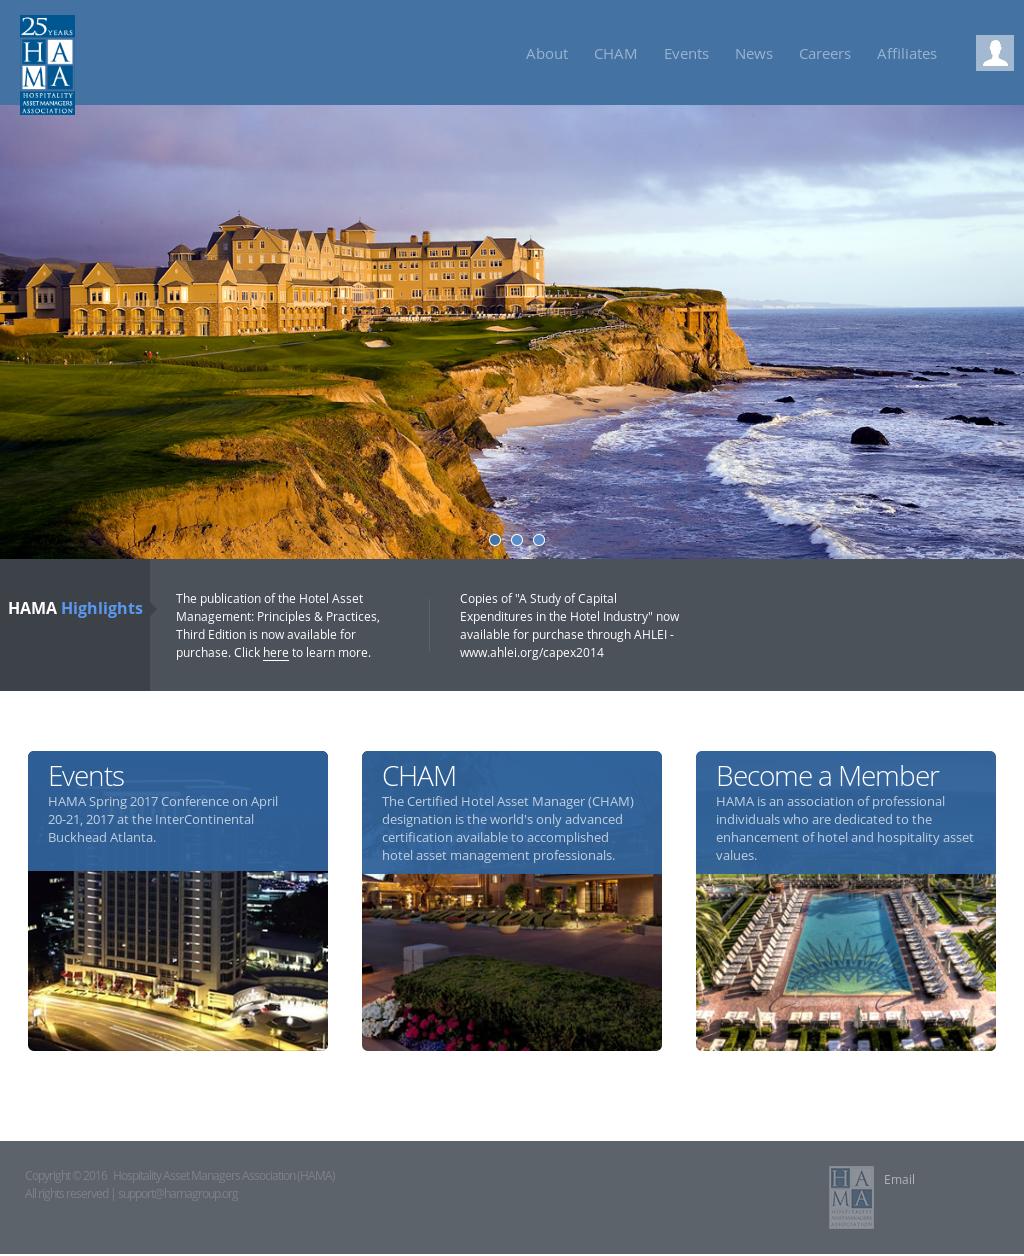 HAMA Competitors, Revenue and Employees - Owler Company Profile